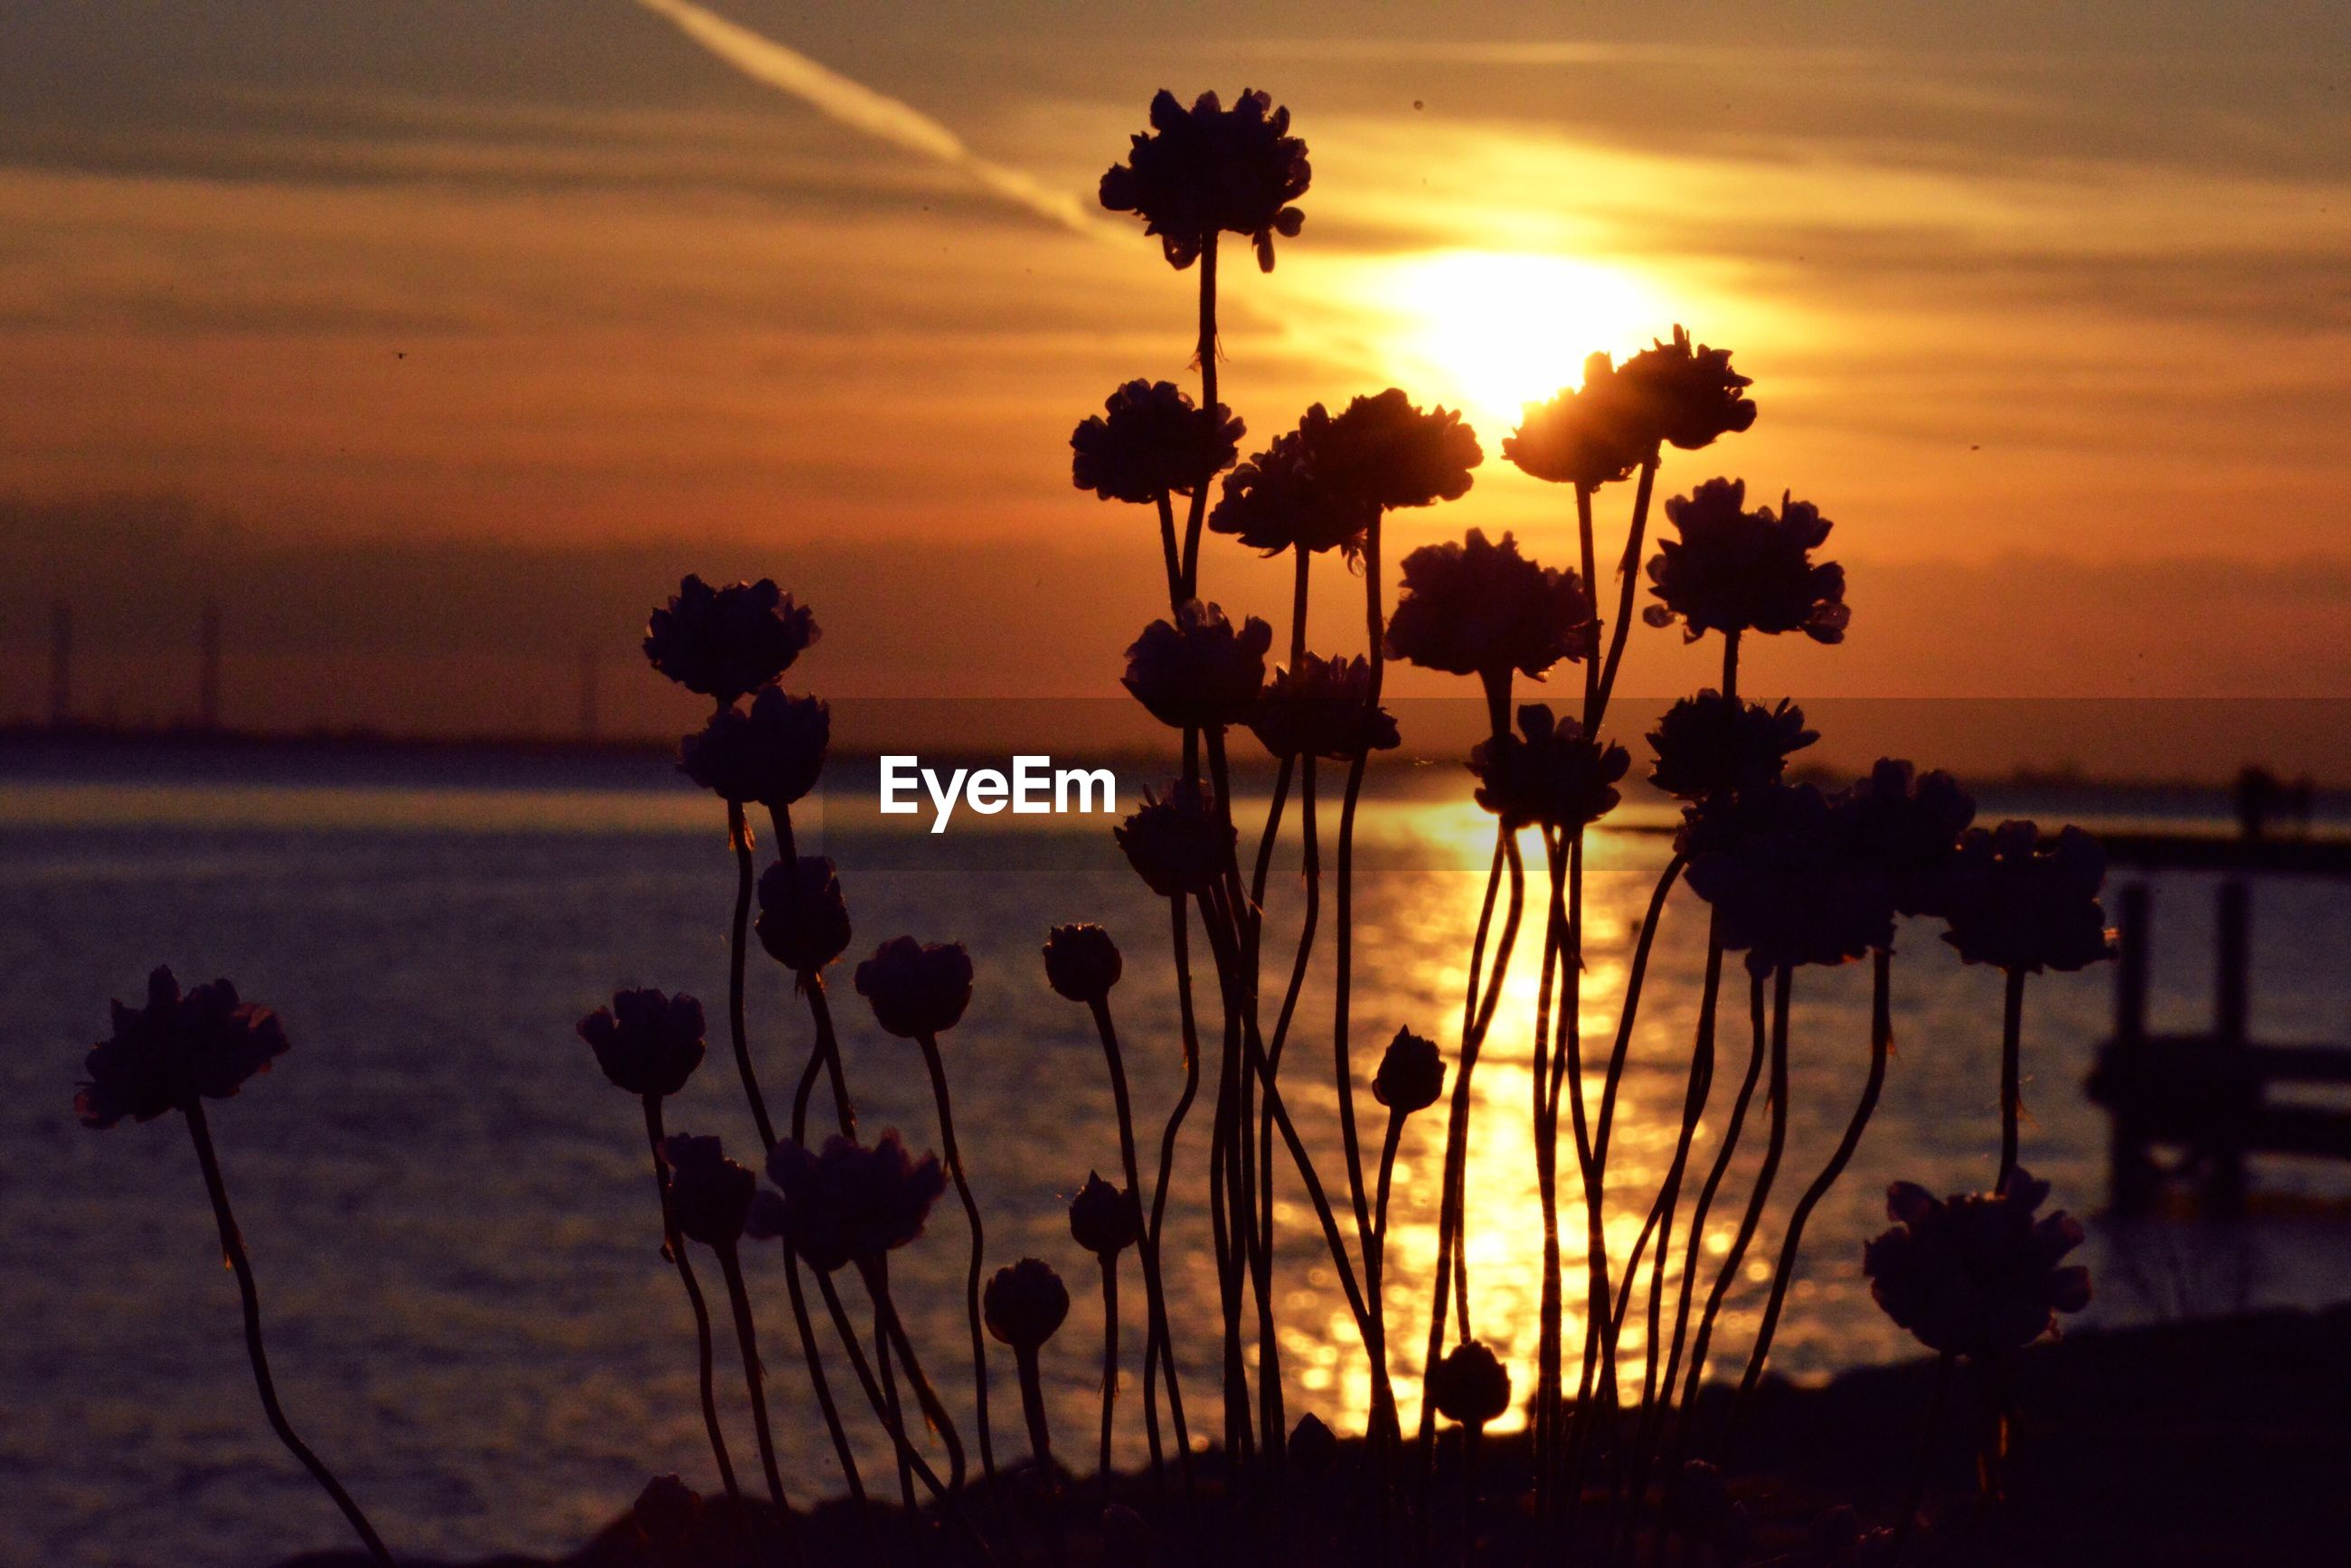 SILHOUETTE PLANTS BY SEA AGAINST ORANGE SKY